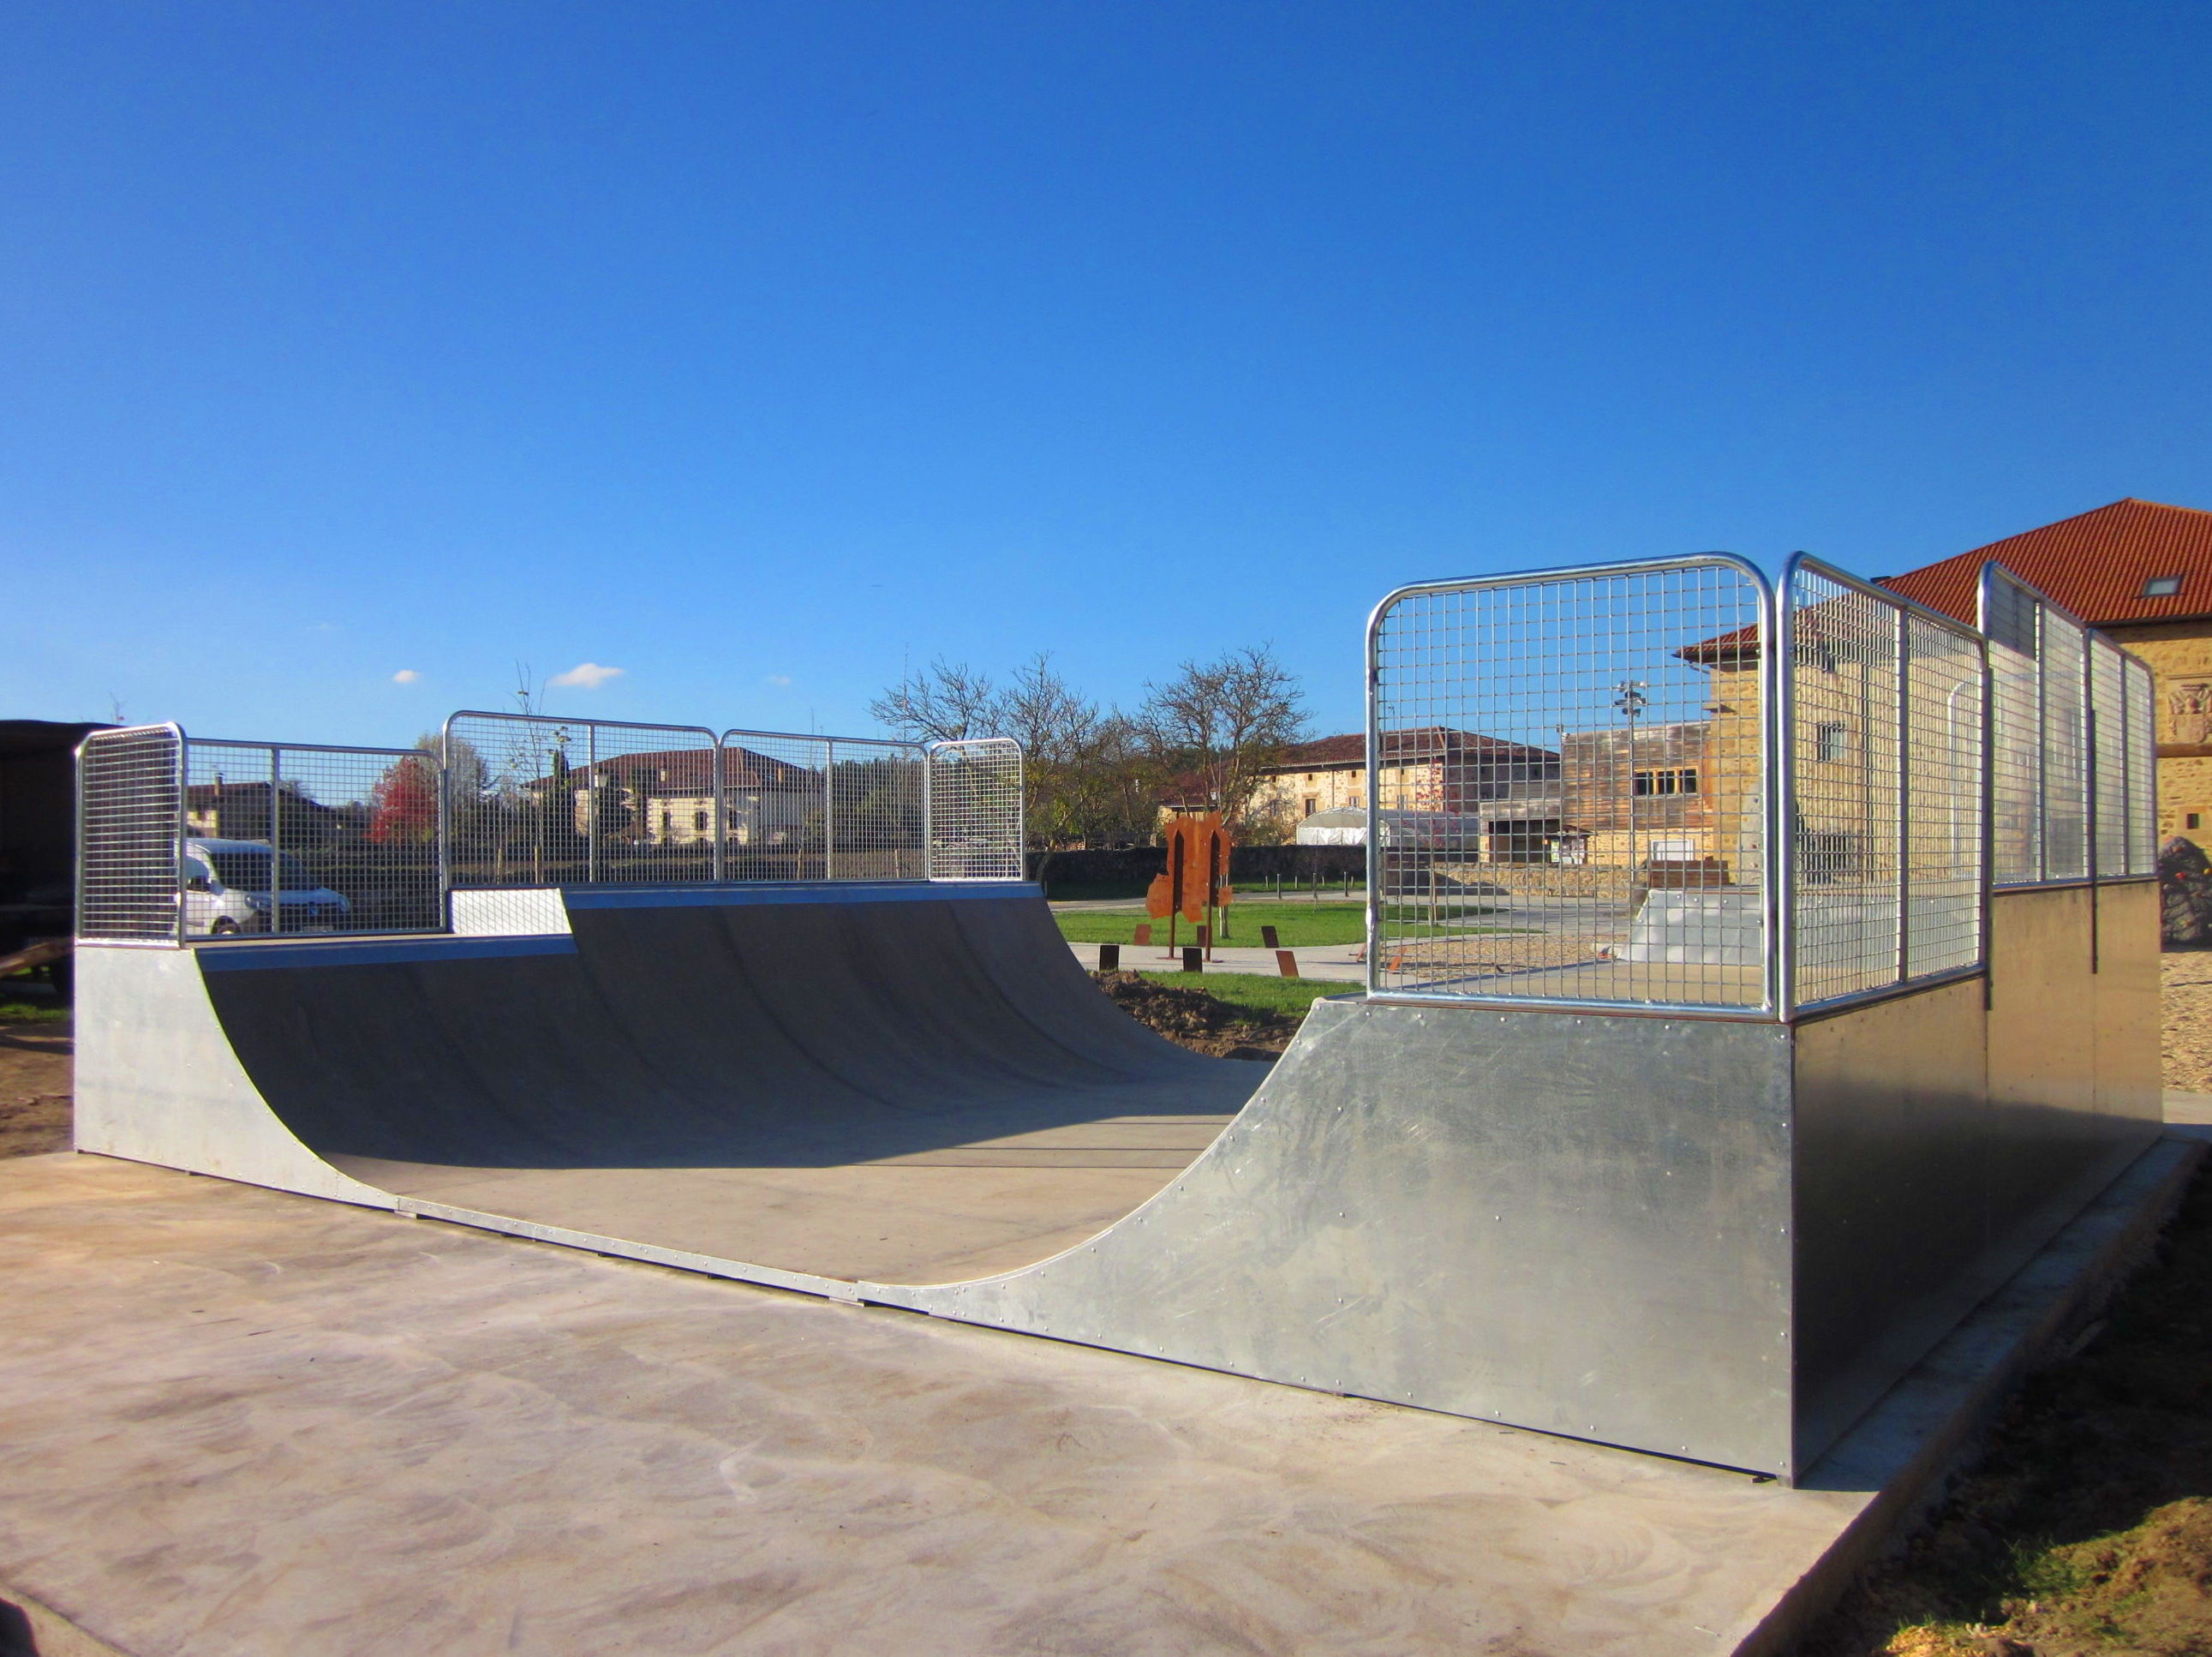 Foto 14 de Skate en Amorebieta | Transformers Skateparks